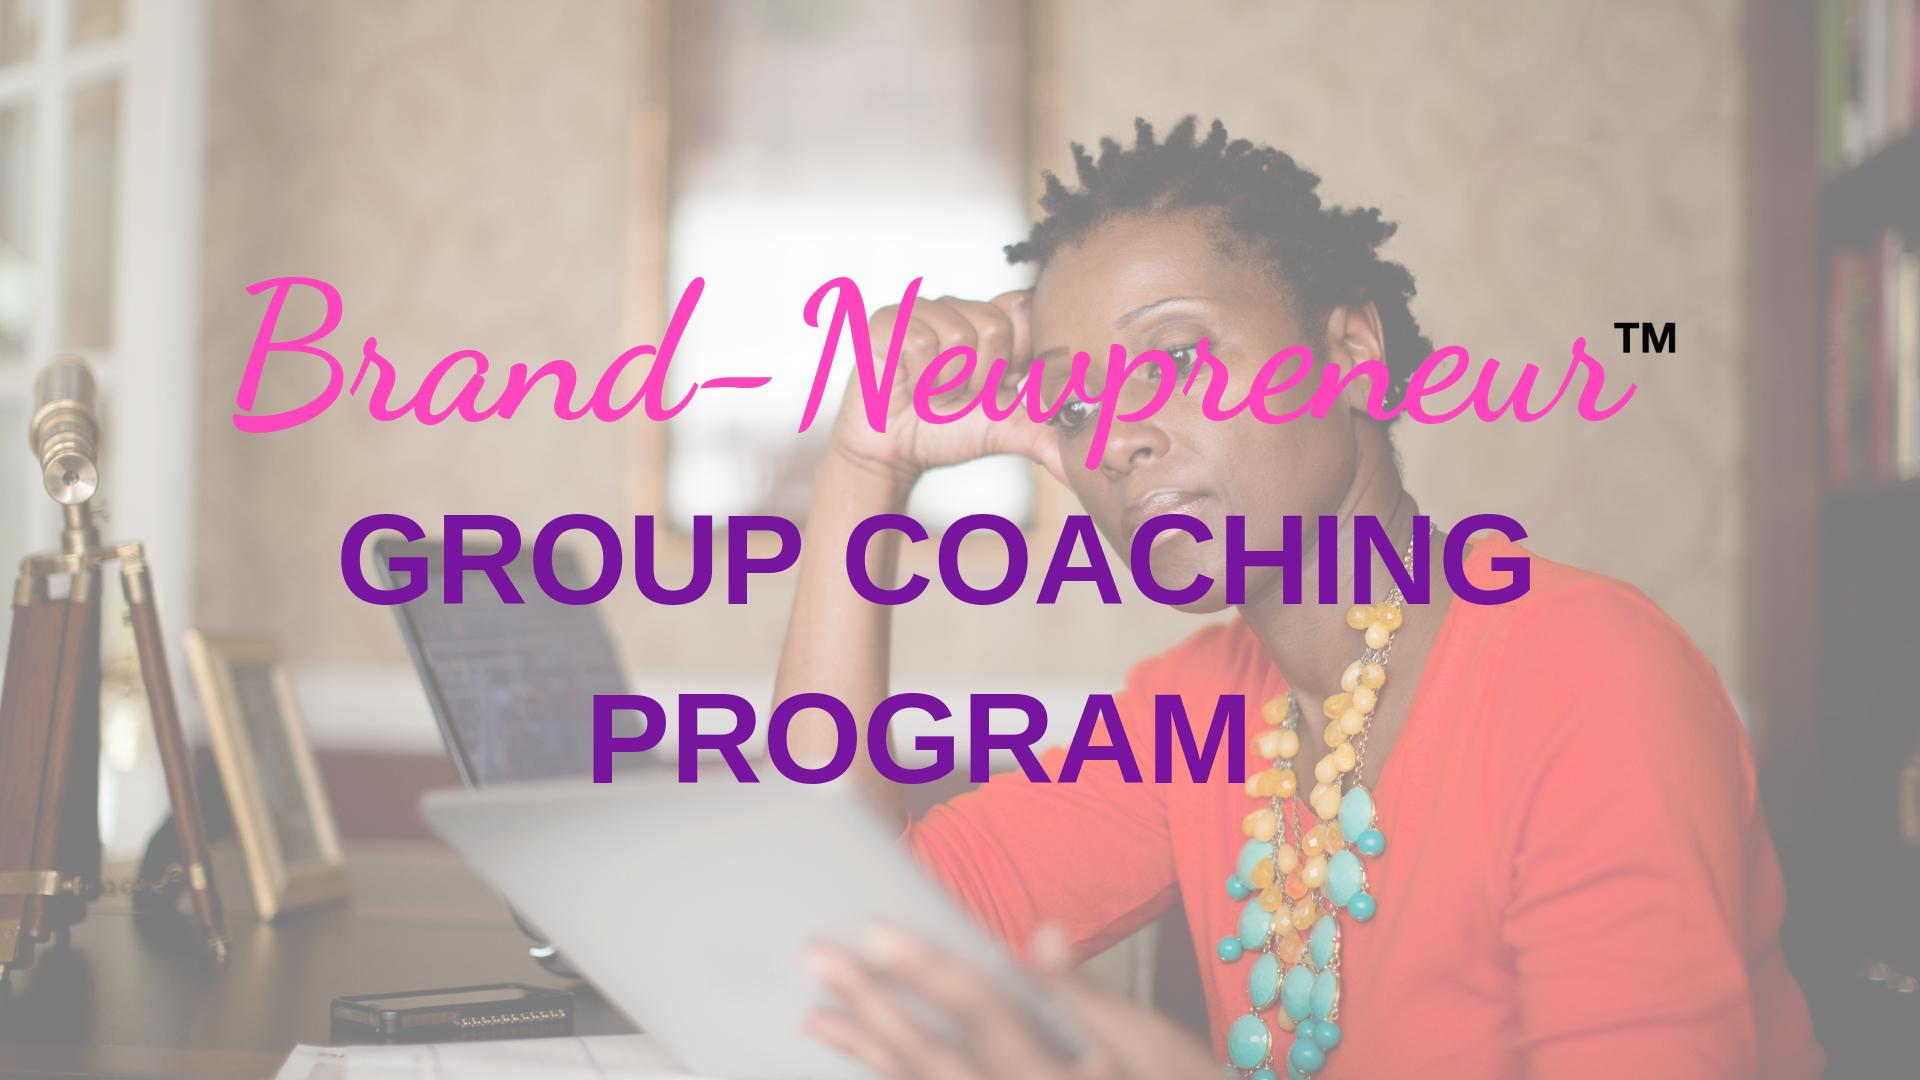 Brand-Newpreneur Group Coaching Program Black Woman holding an iPad looking perplexed.